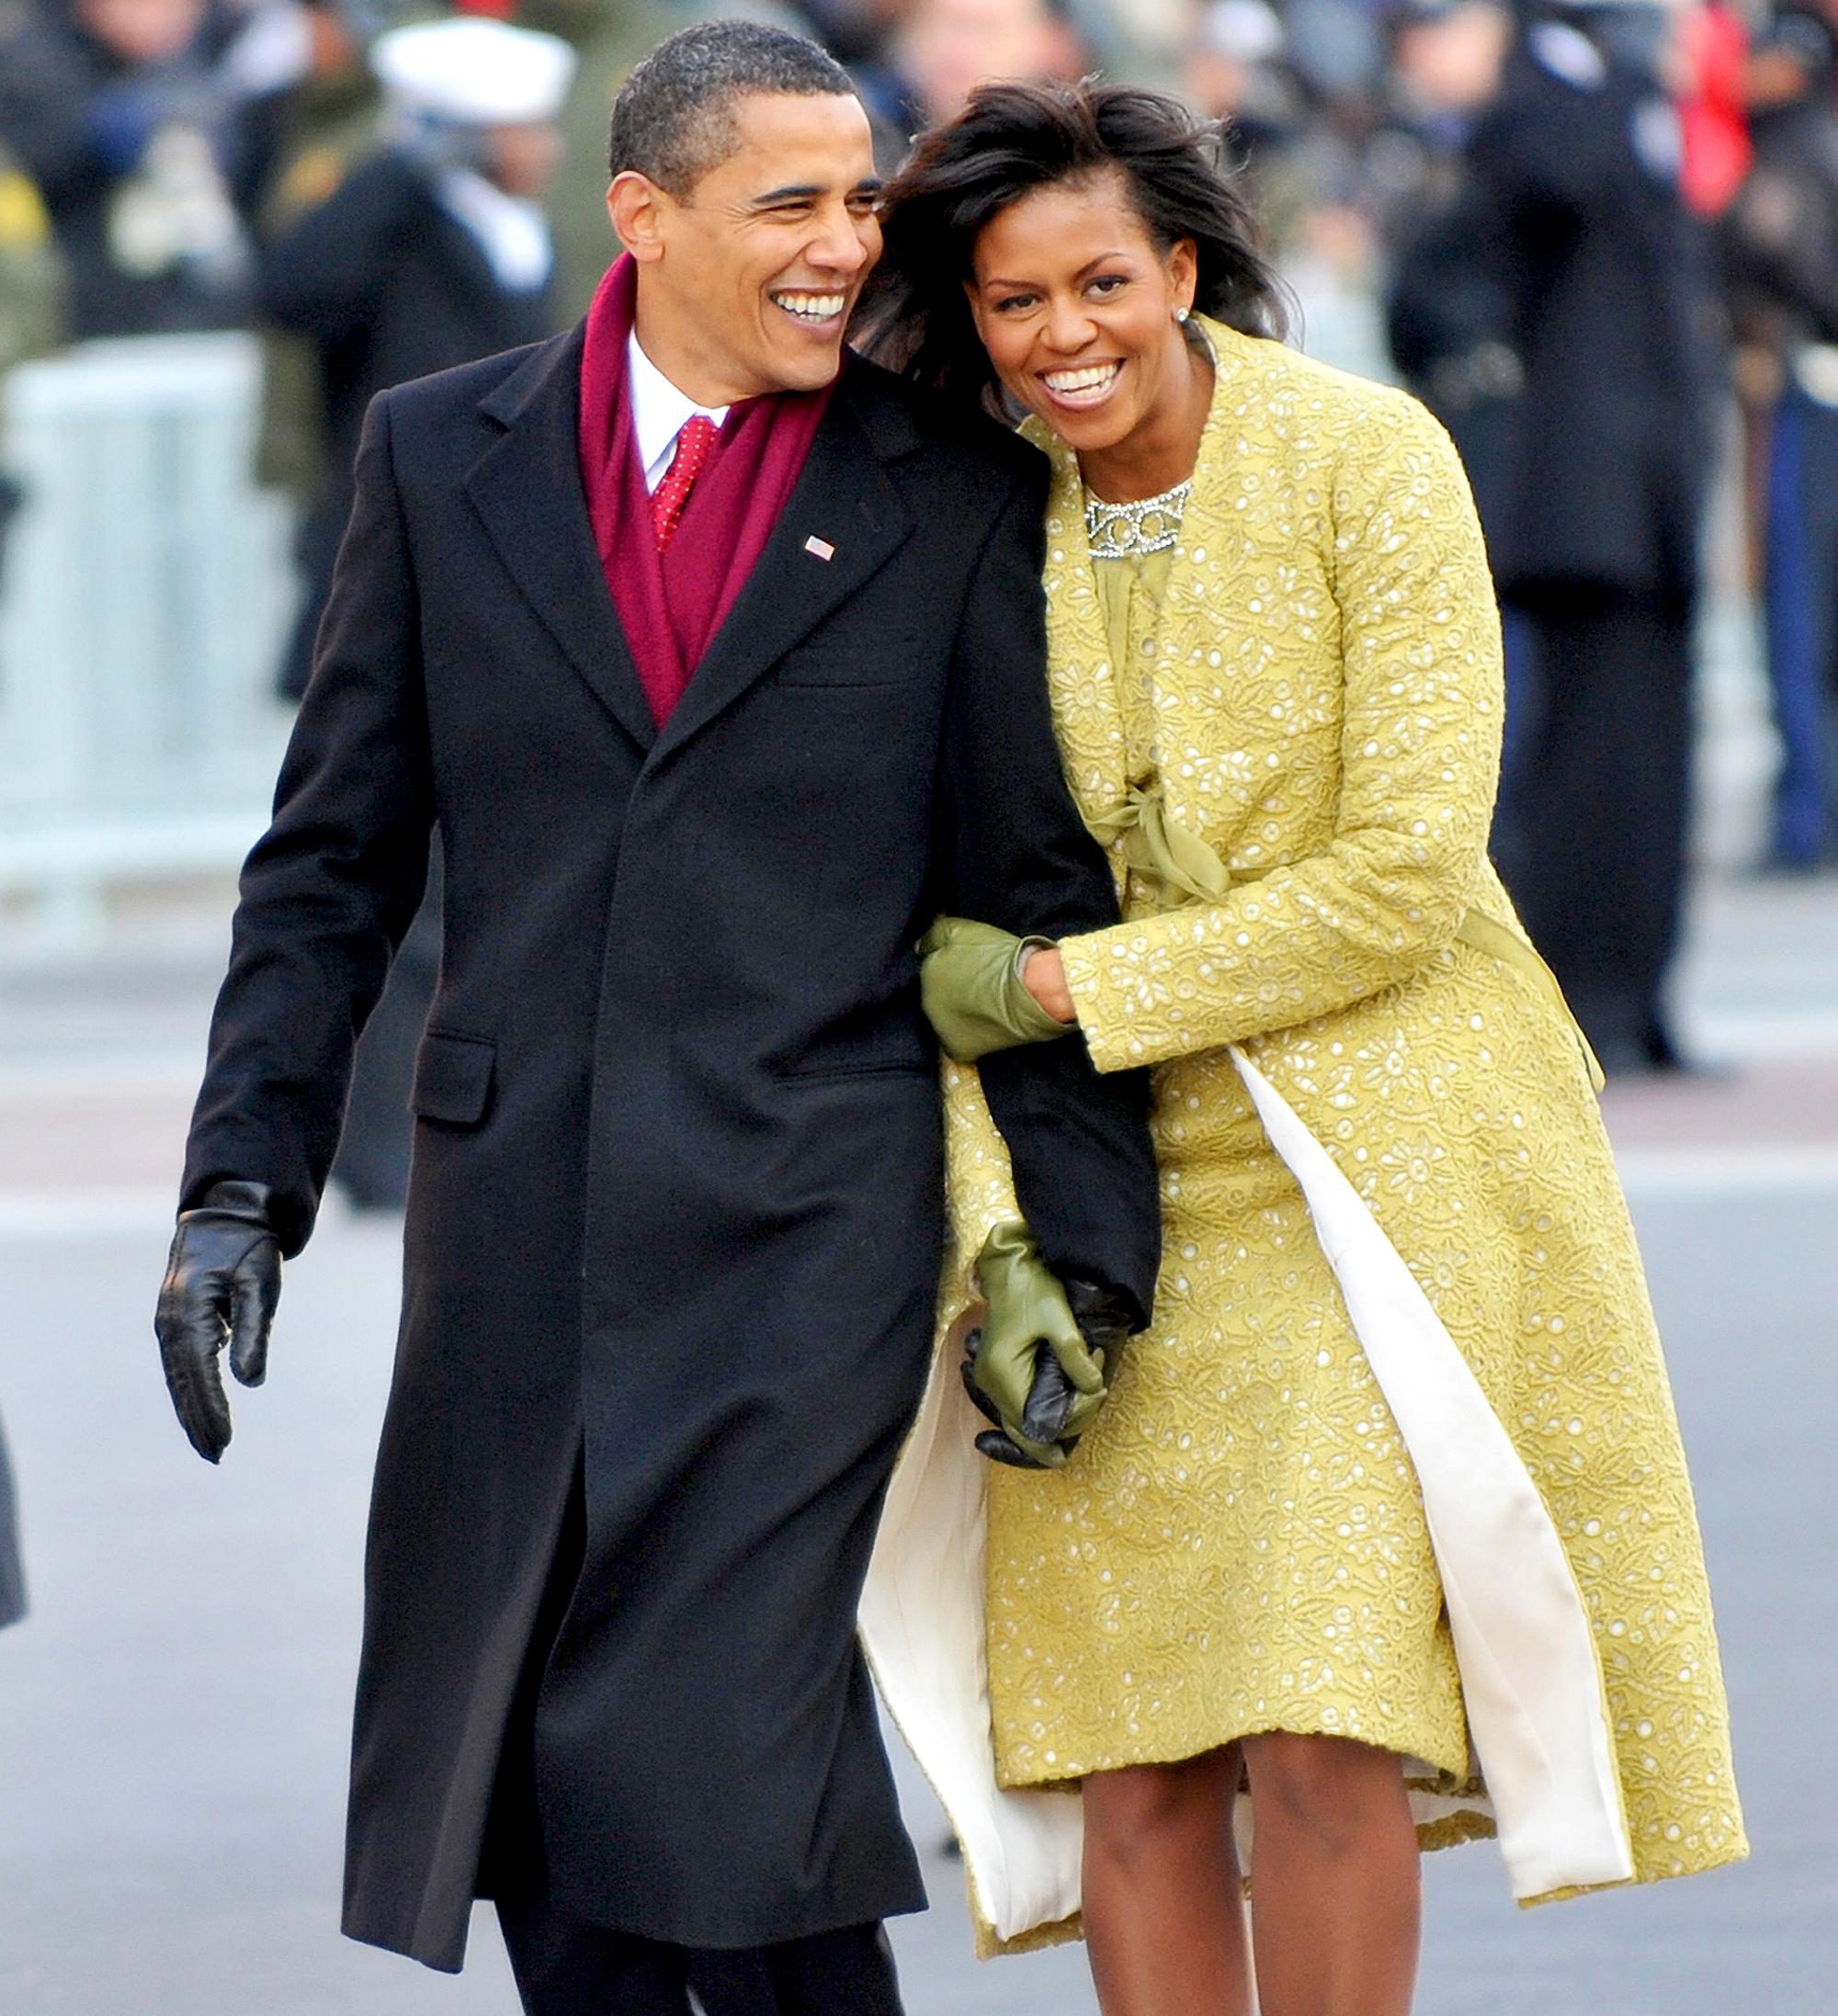 Barack Obama and Michelle Obama